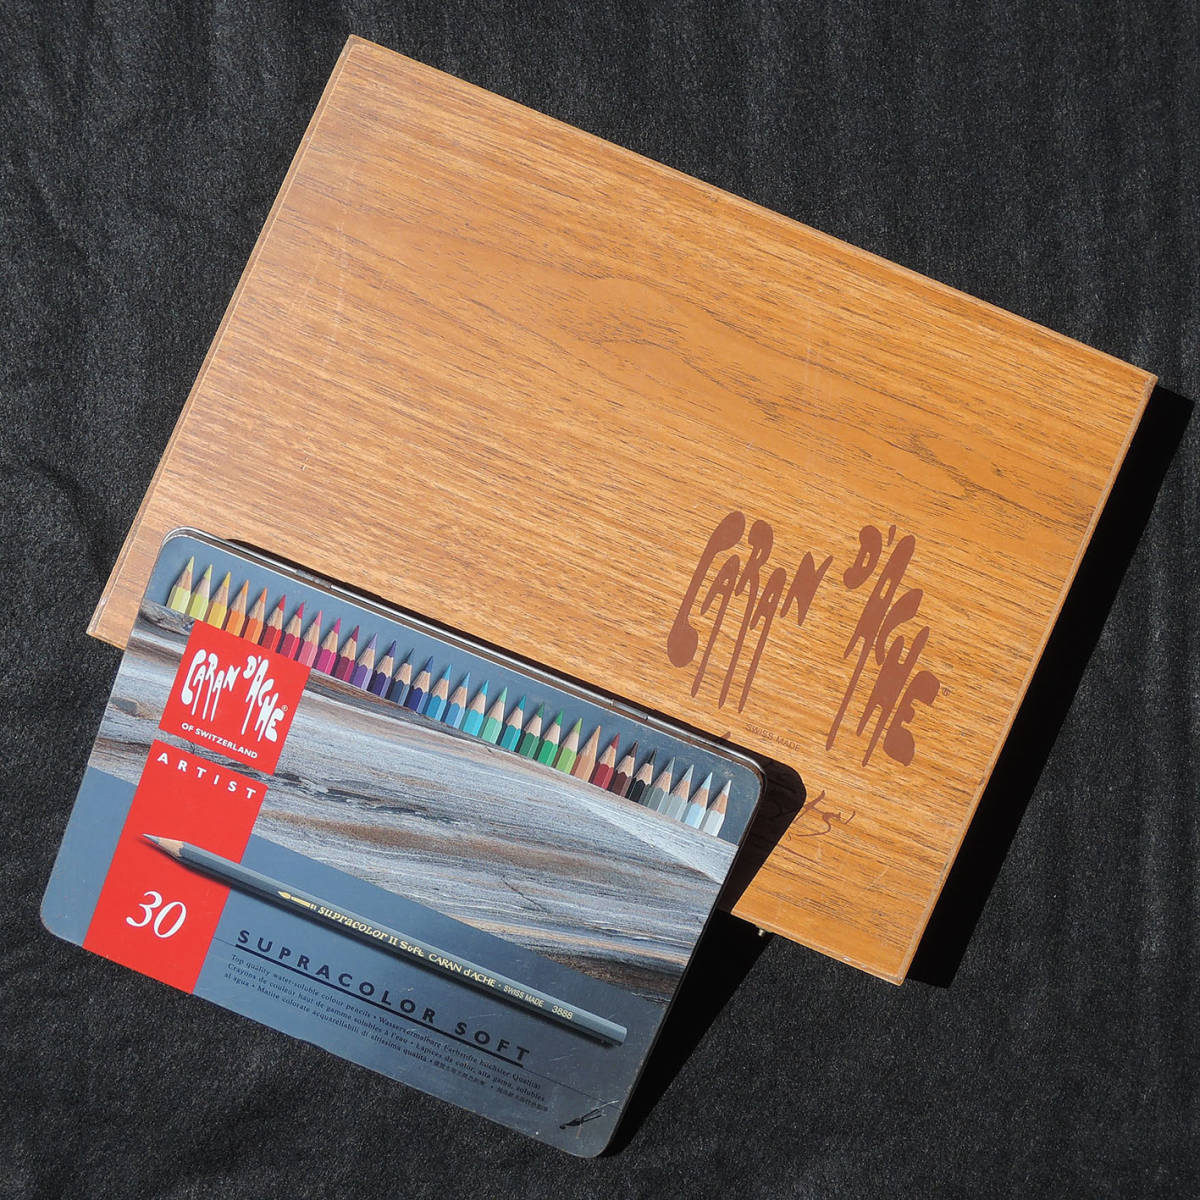 CARAN d'ACHE カランダッシュ Neocolor II ネオカラー x 72色 Supracolor II Soft x 10 + 30色